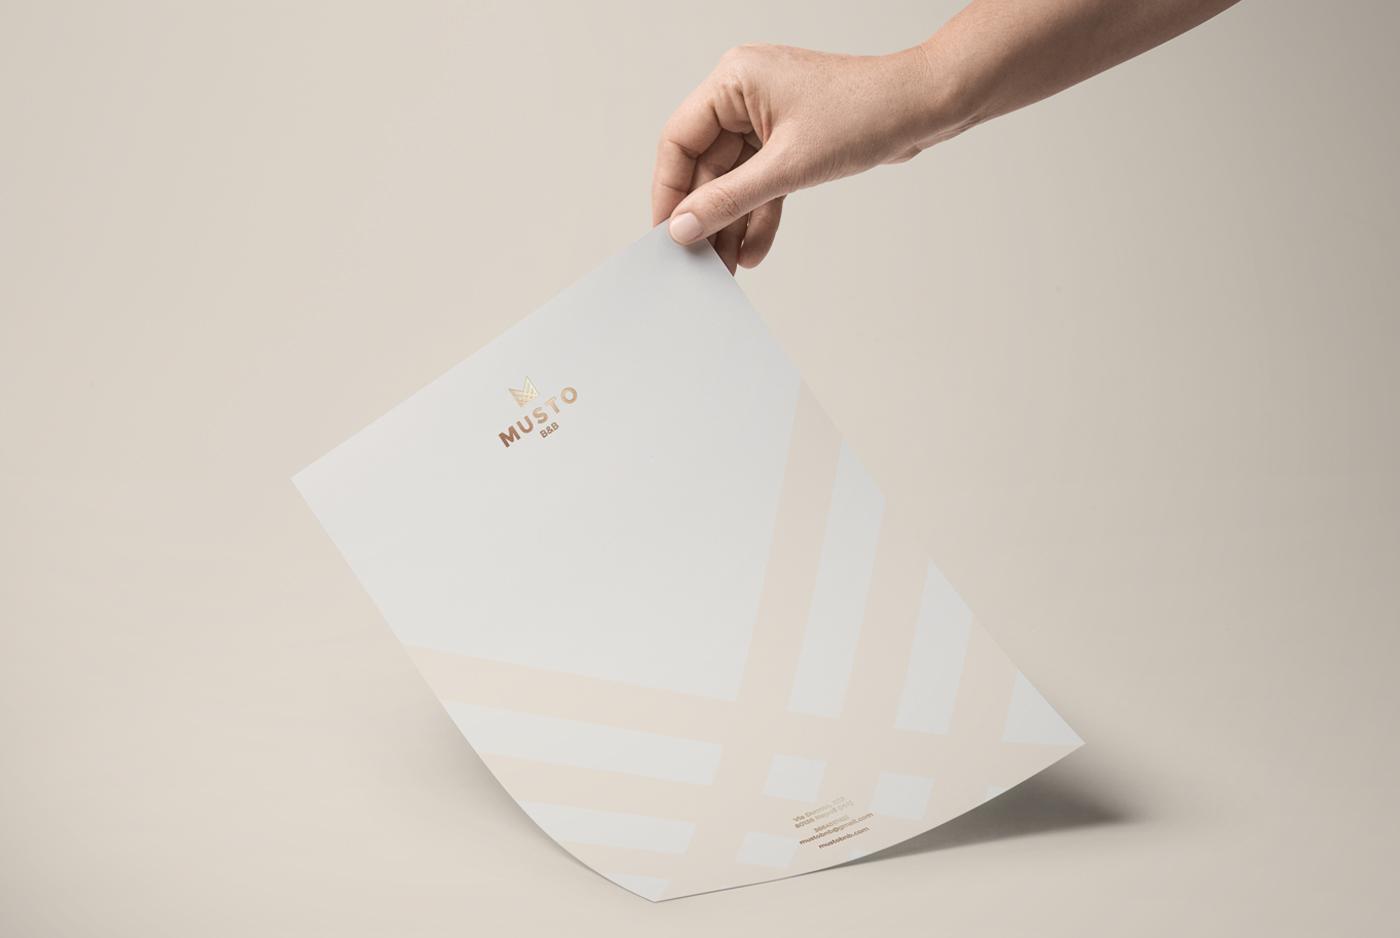 brand identity logo design gold foil cards Stationery Business Cards letterhead